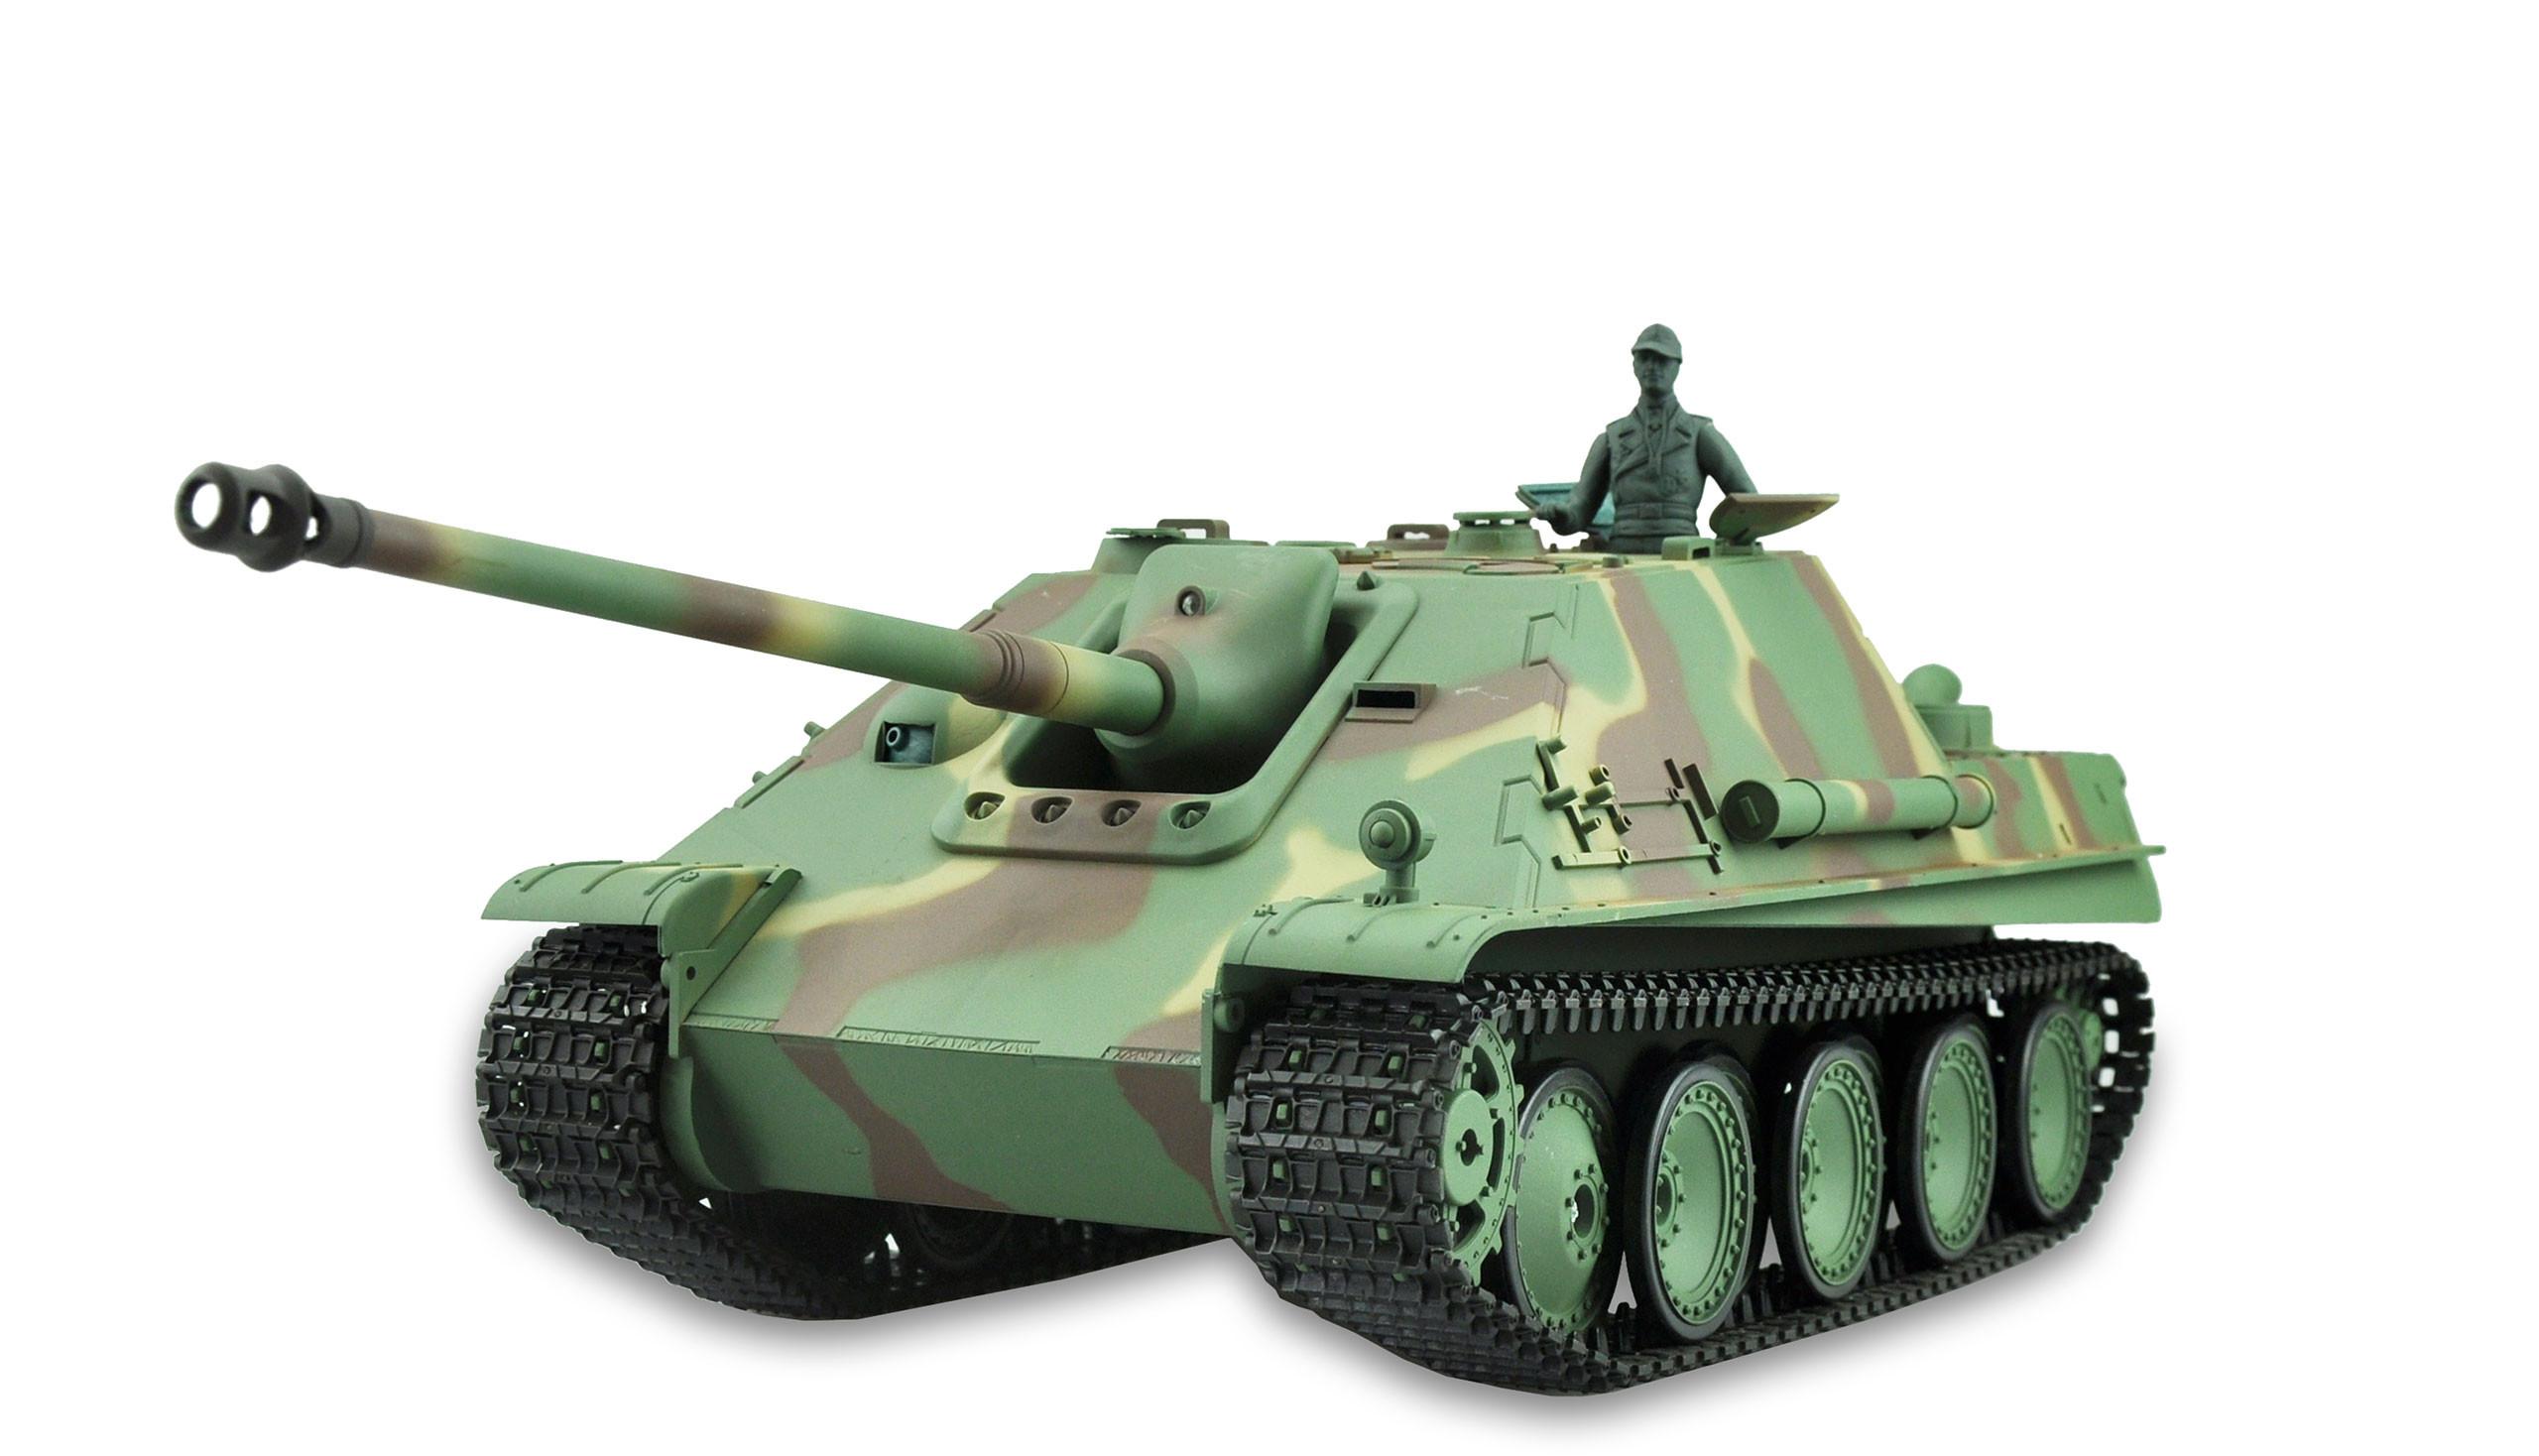 Amewi 23068 - Funkgesteuerter (RC) Panzer - Elektromotor - 1:16 - Betriebsbereit (RTR) - Camouflage - 2,4 GHz